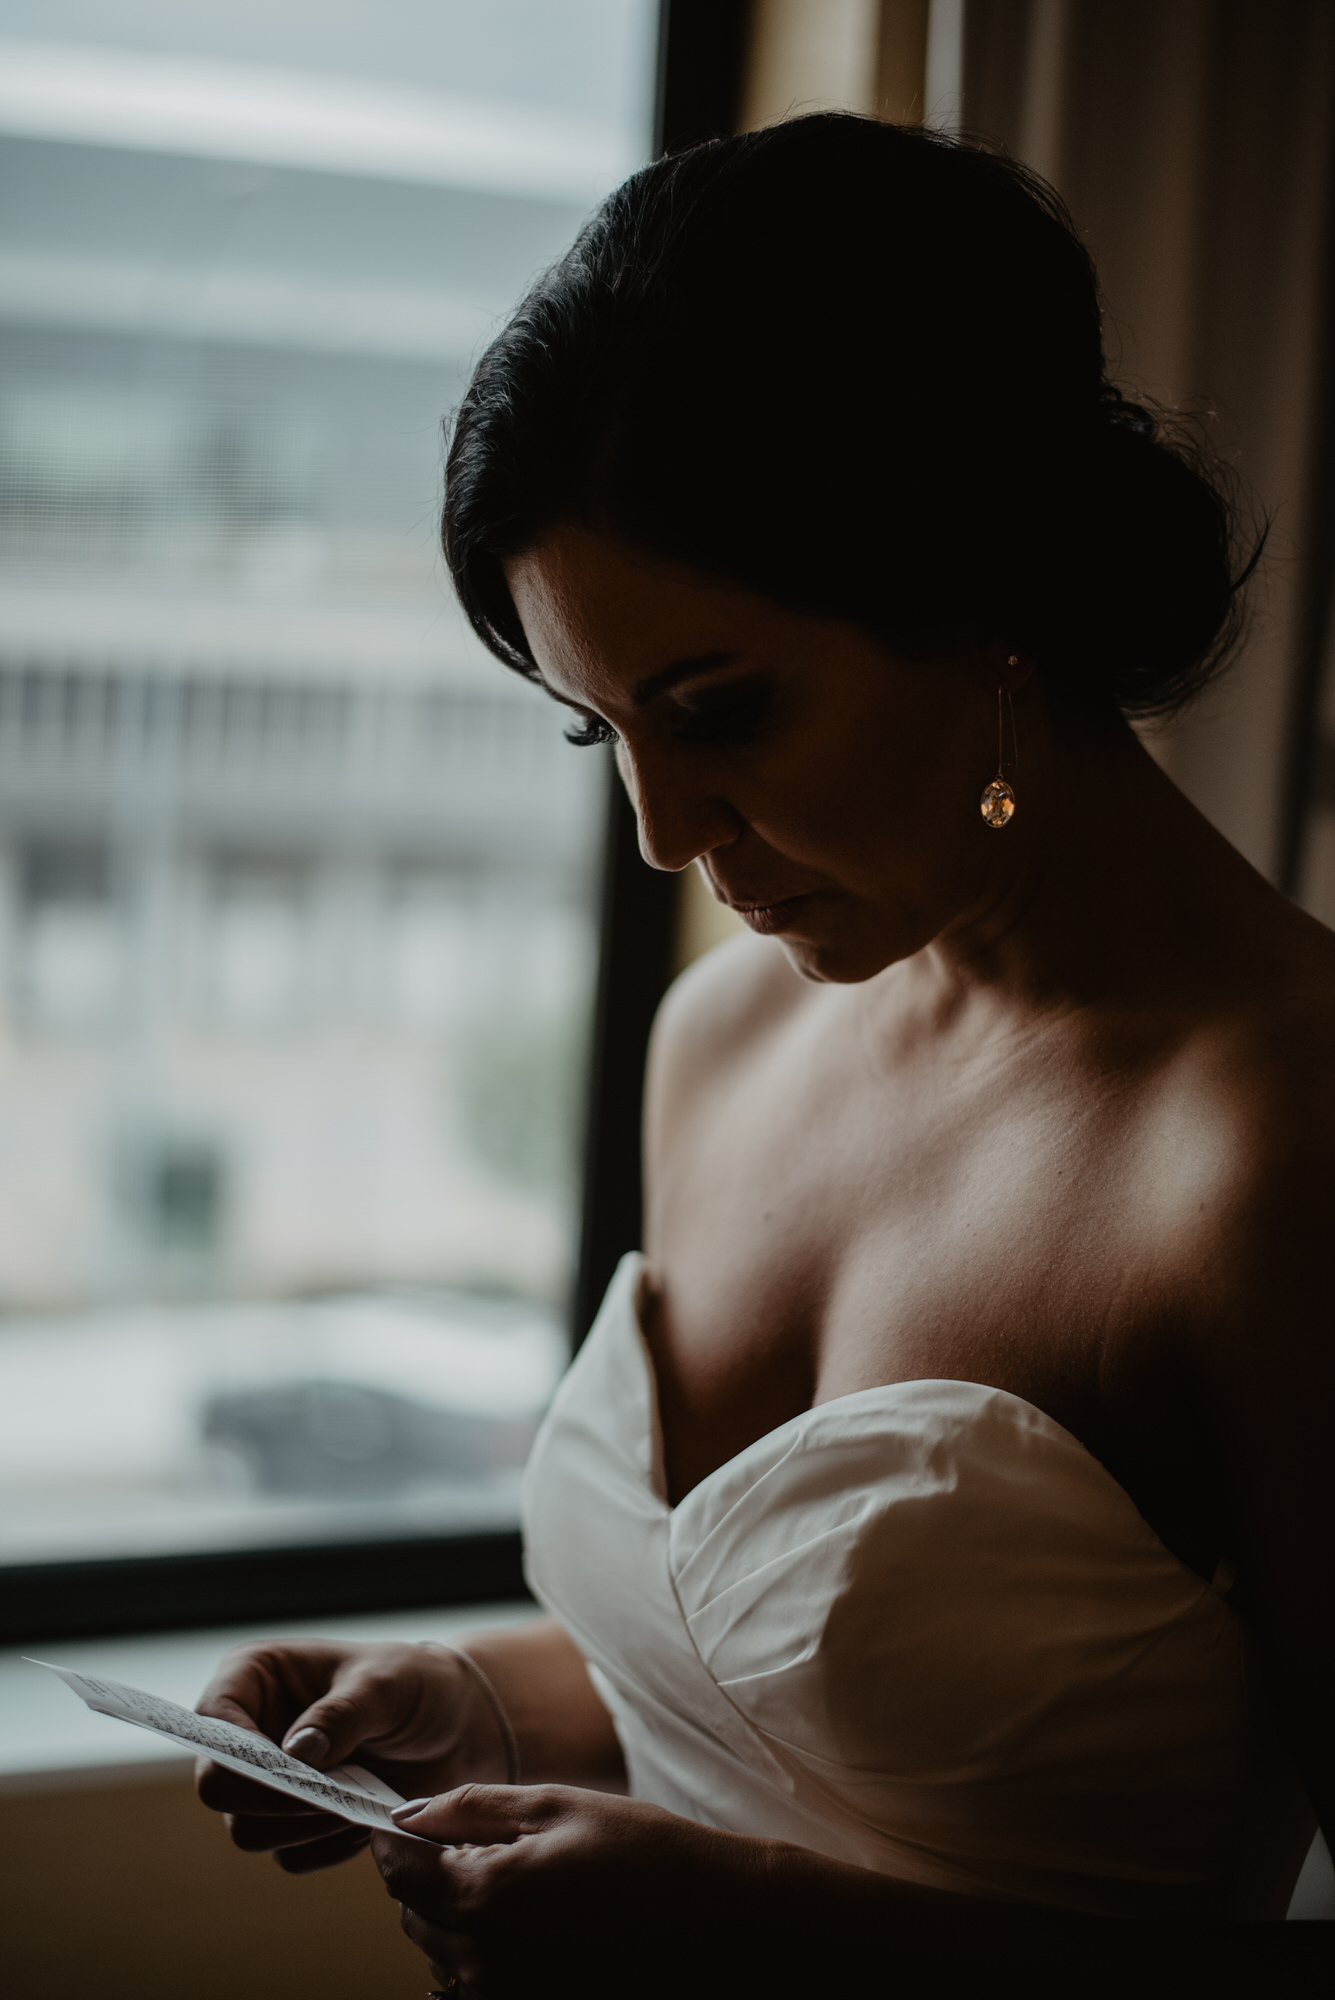 Kaylie_Sirek_Photography_Grand_Island_Kearney_Hastings_Lincoln_Nebraska_Wedding_Engagement_Grandma_Grandparent_Delray_Downtown_DowntownLincoln_LNK_Emotional_Bride_Groom_Photographer_13.jpg